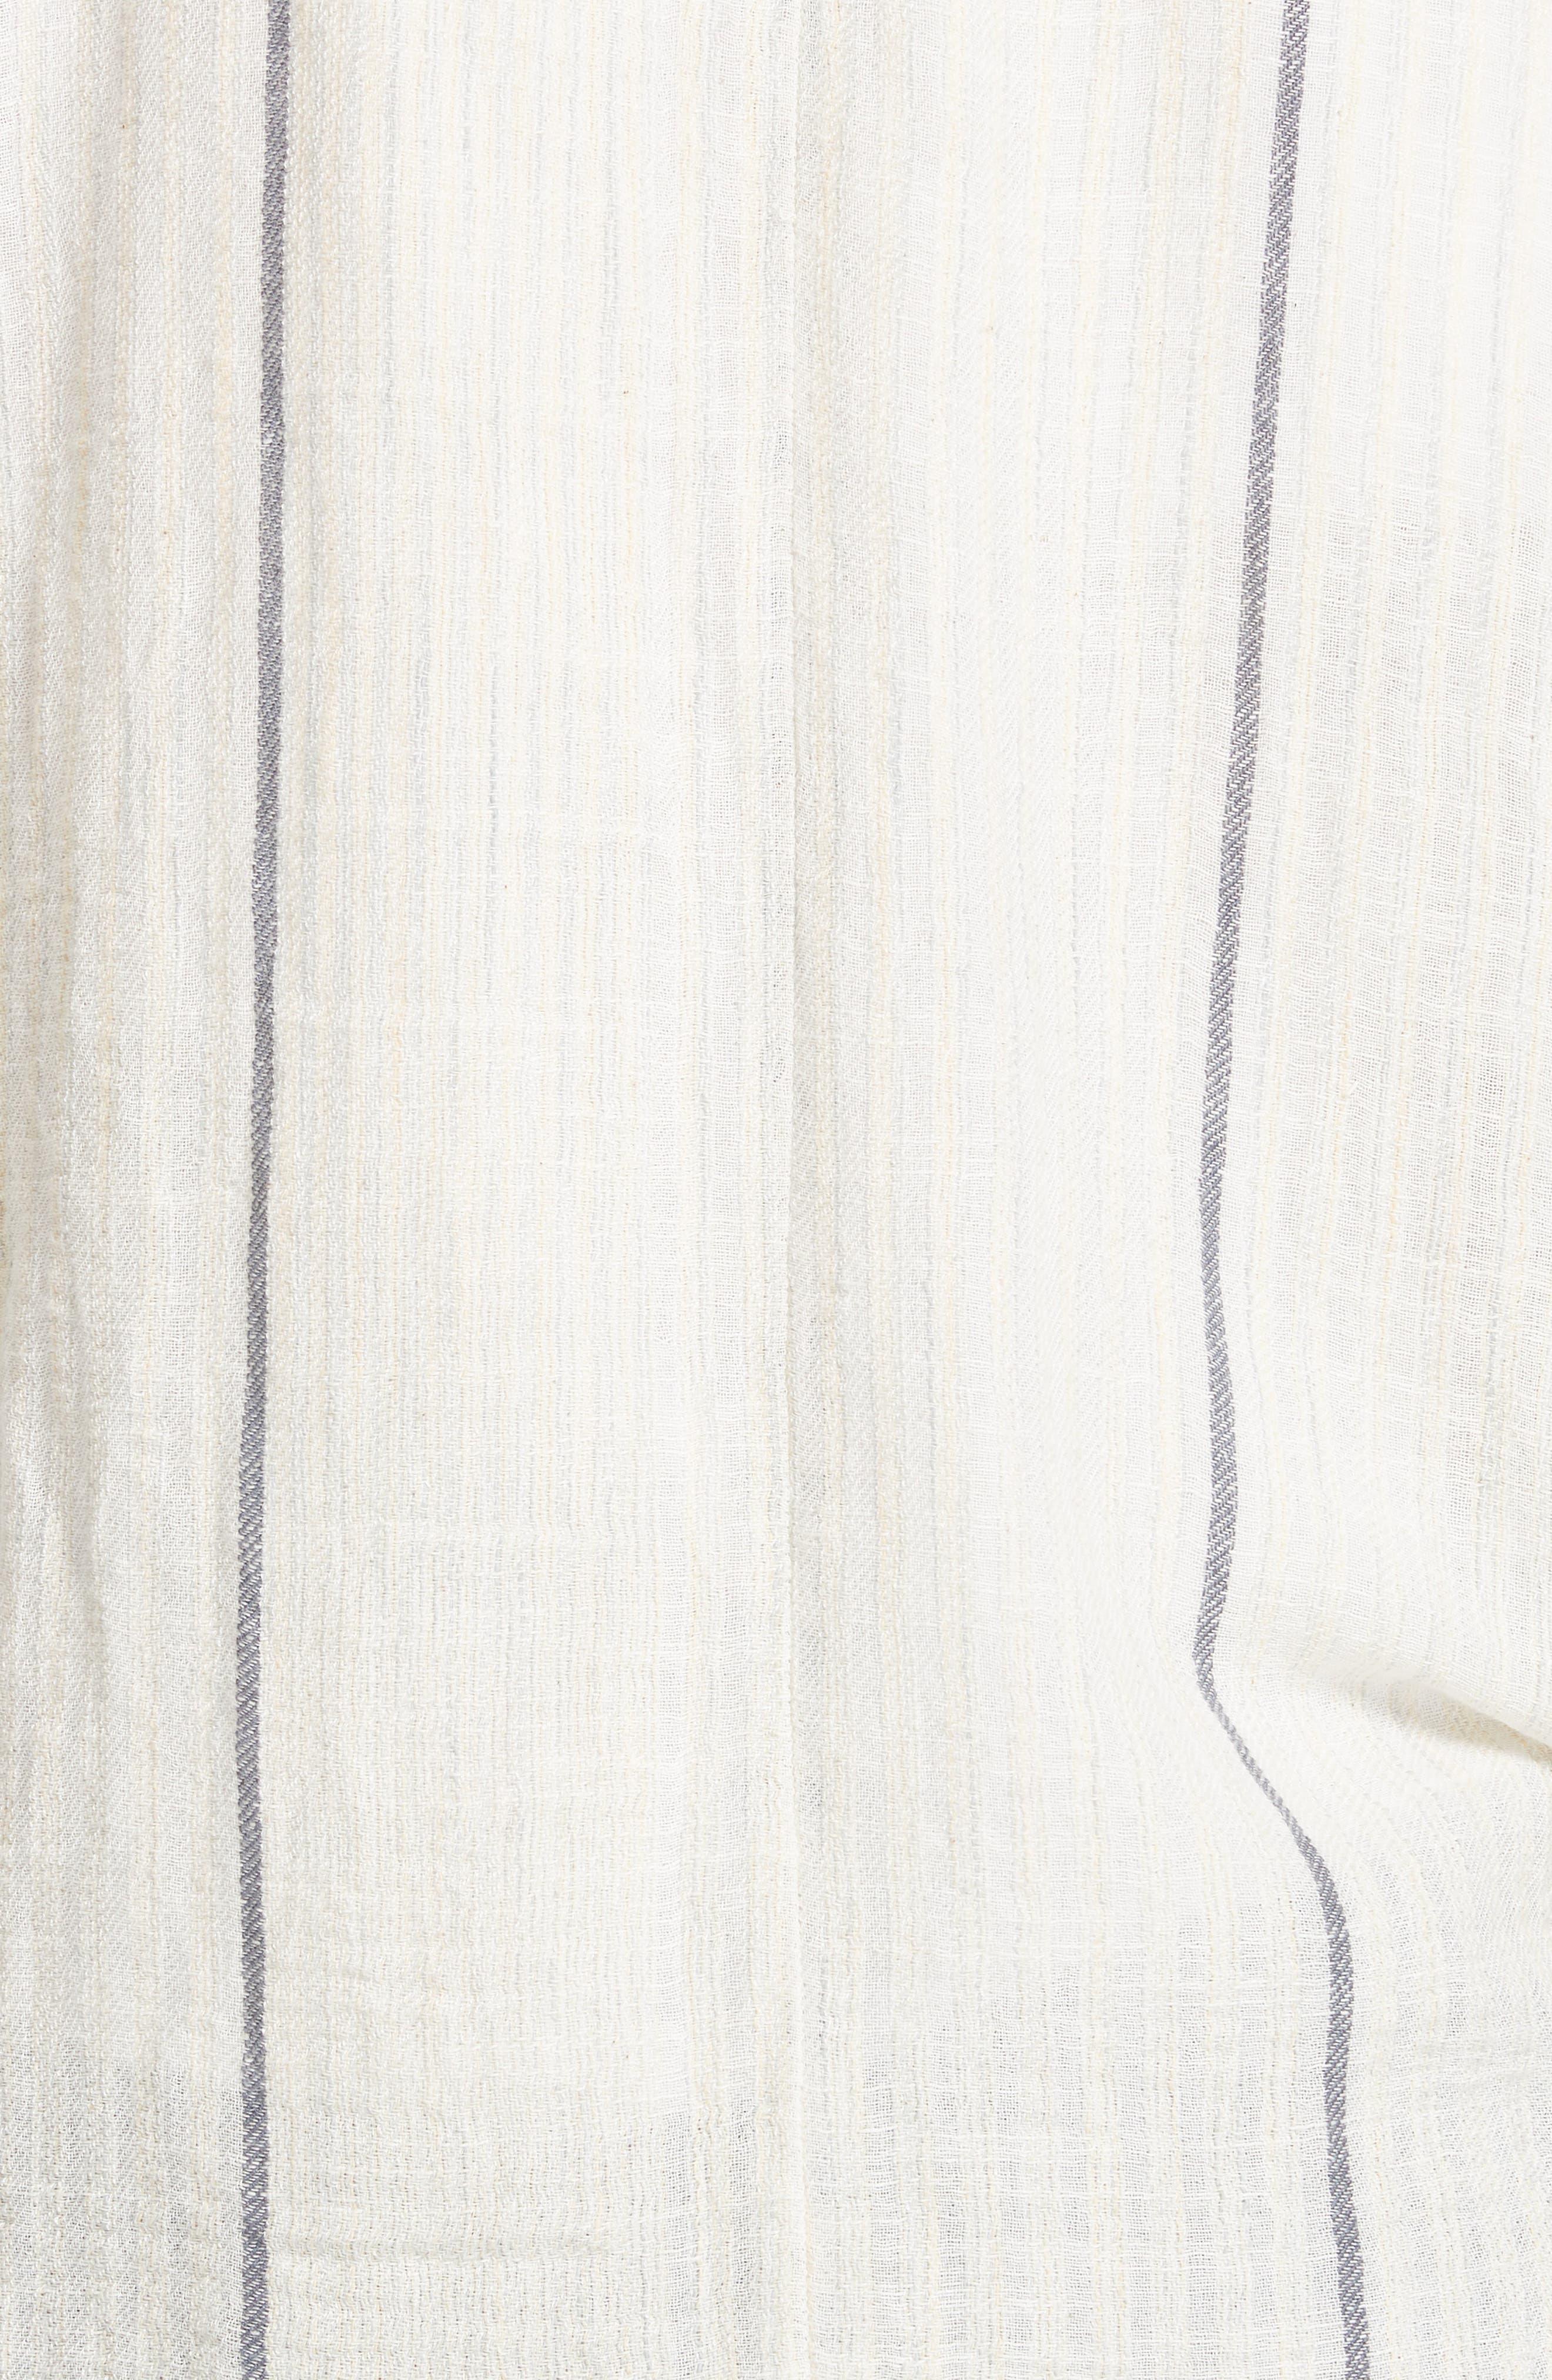 Aria Denim Collar Blazer,                             Alternate thumbnail 5, color,                             Ivory Combo